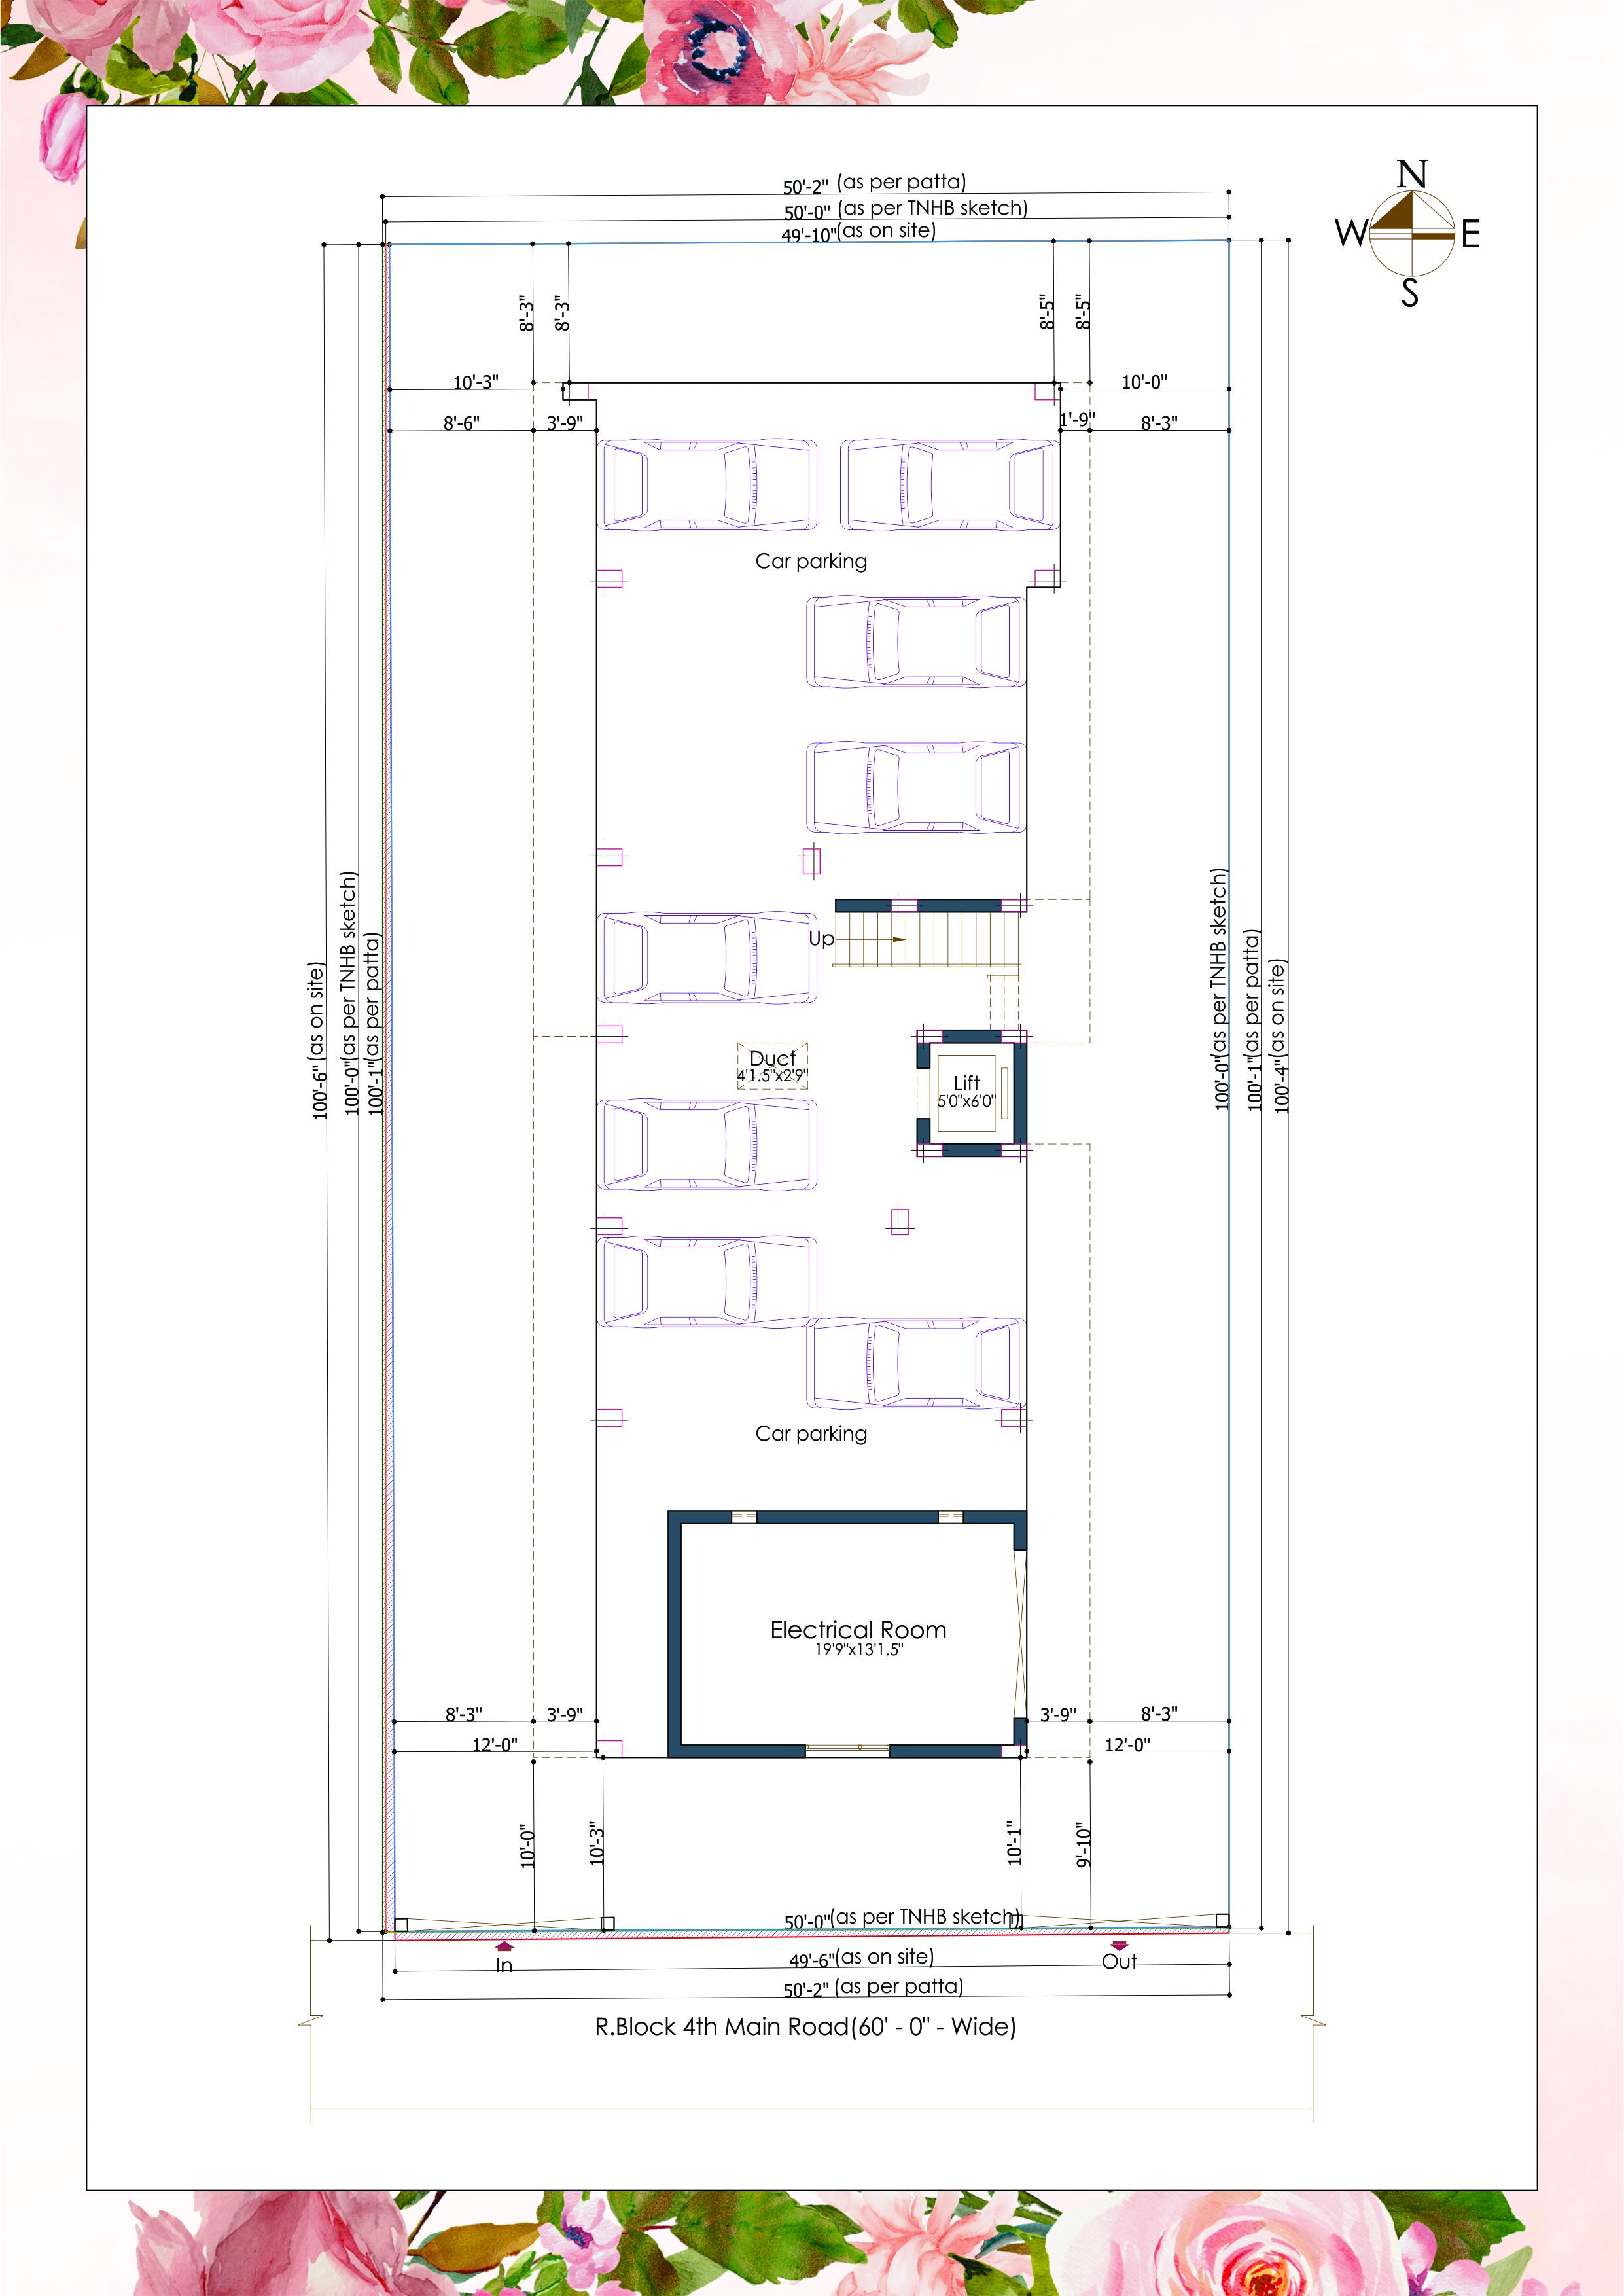 https://firmfoundations.in/projects/floorplans/thumbnails/15690417178R_85__updated_Stilt.jpg